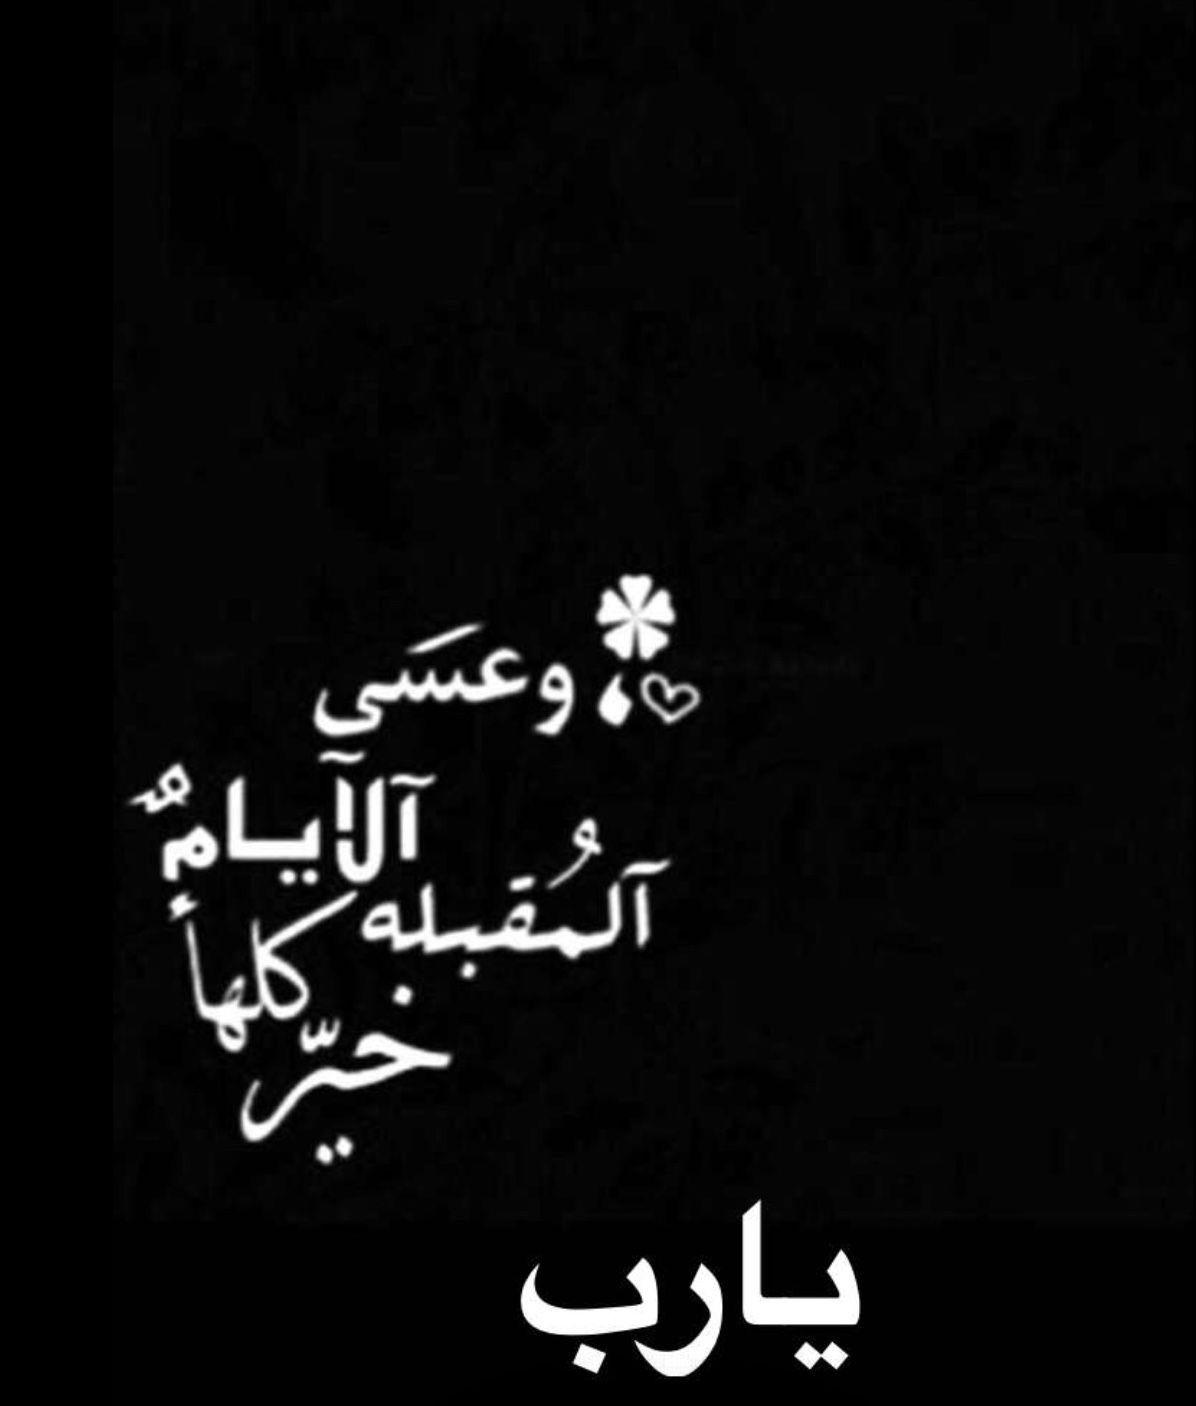 Pin By عنود البلاجي On Journal Calligraphy Arabic Calligraphy